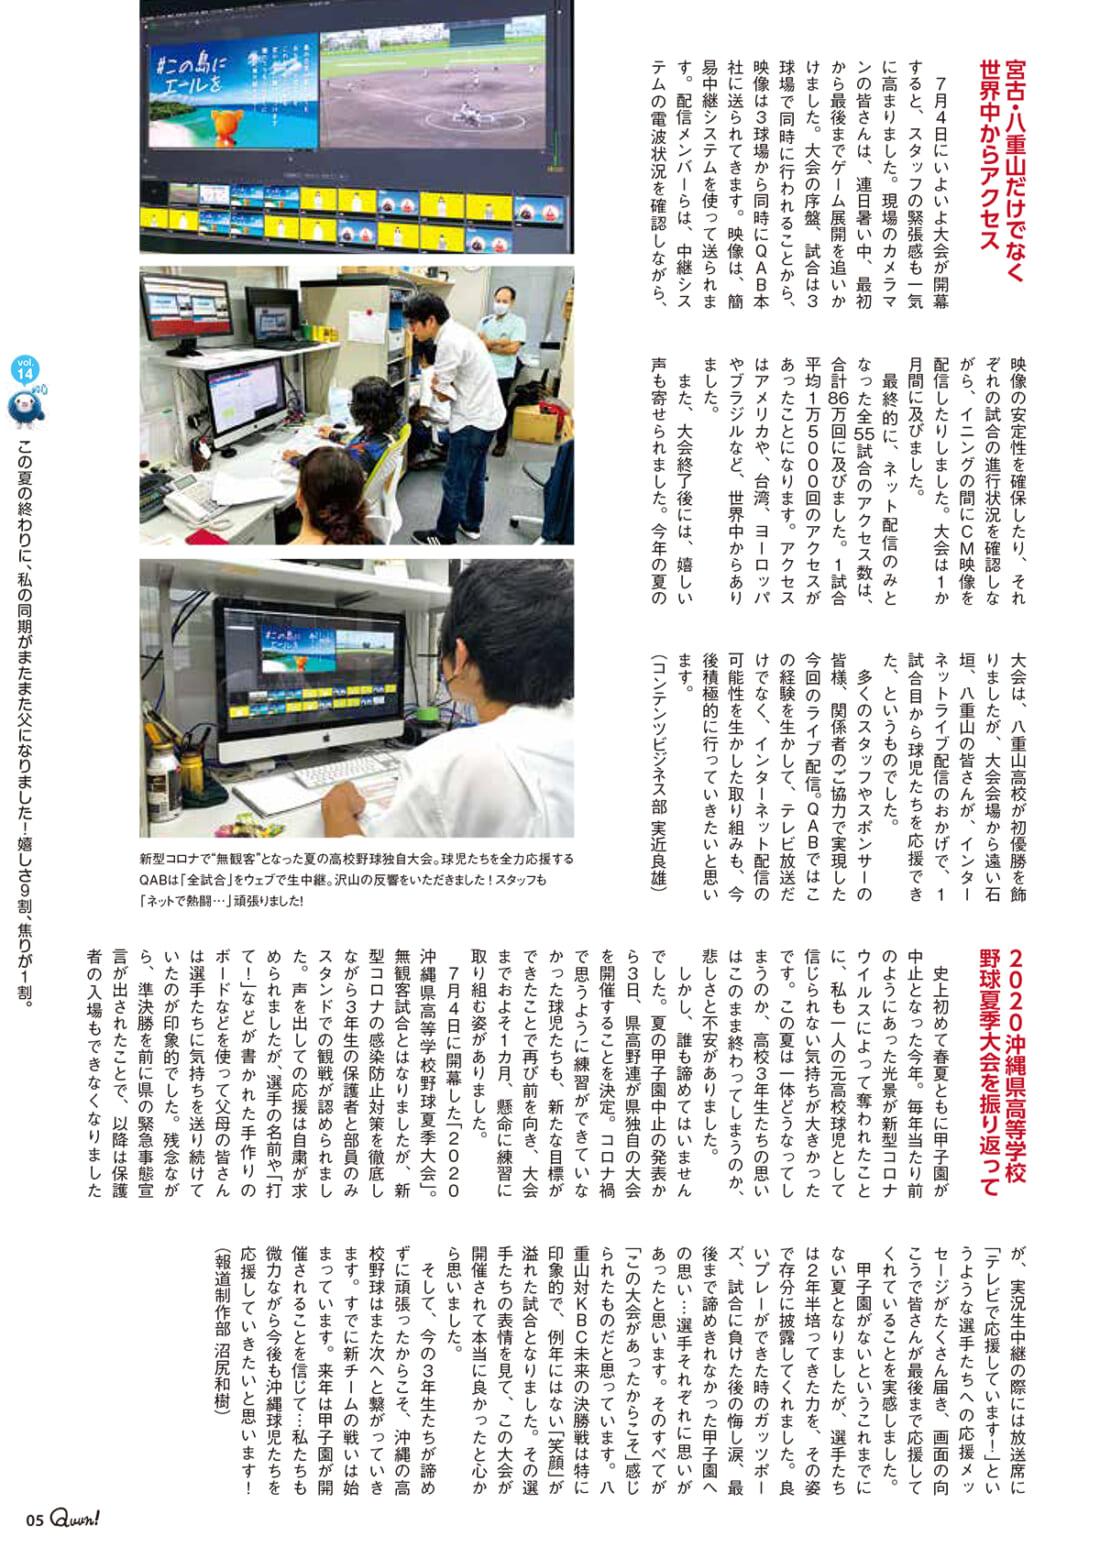 https://www.qab.co.jp/qgoro/wp-content/uploads/quun_1407-1100x1558.jpg